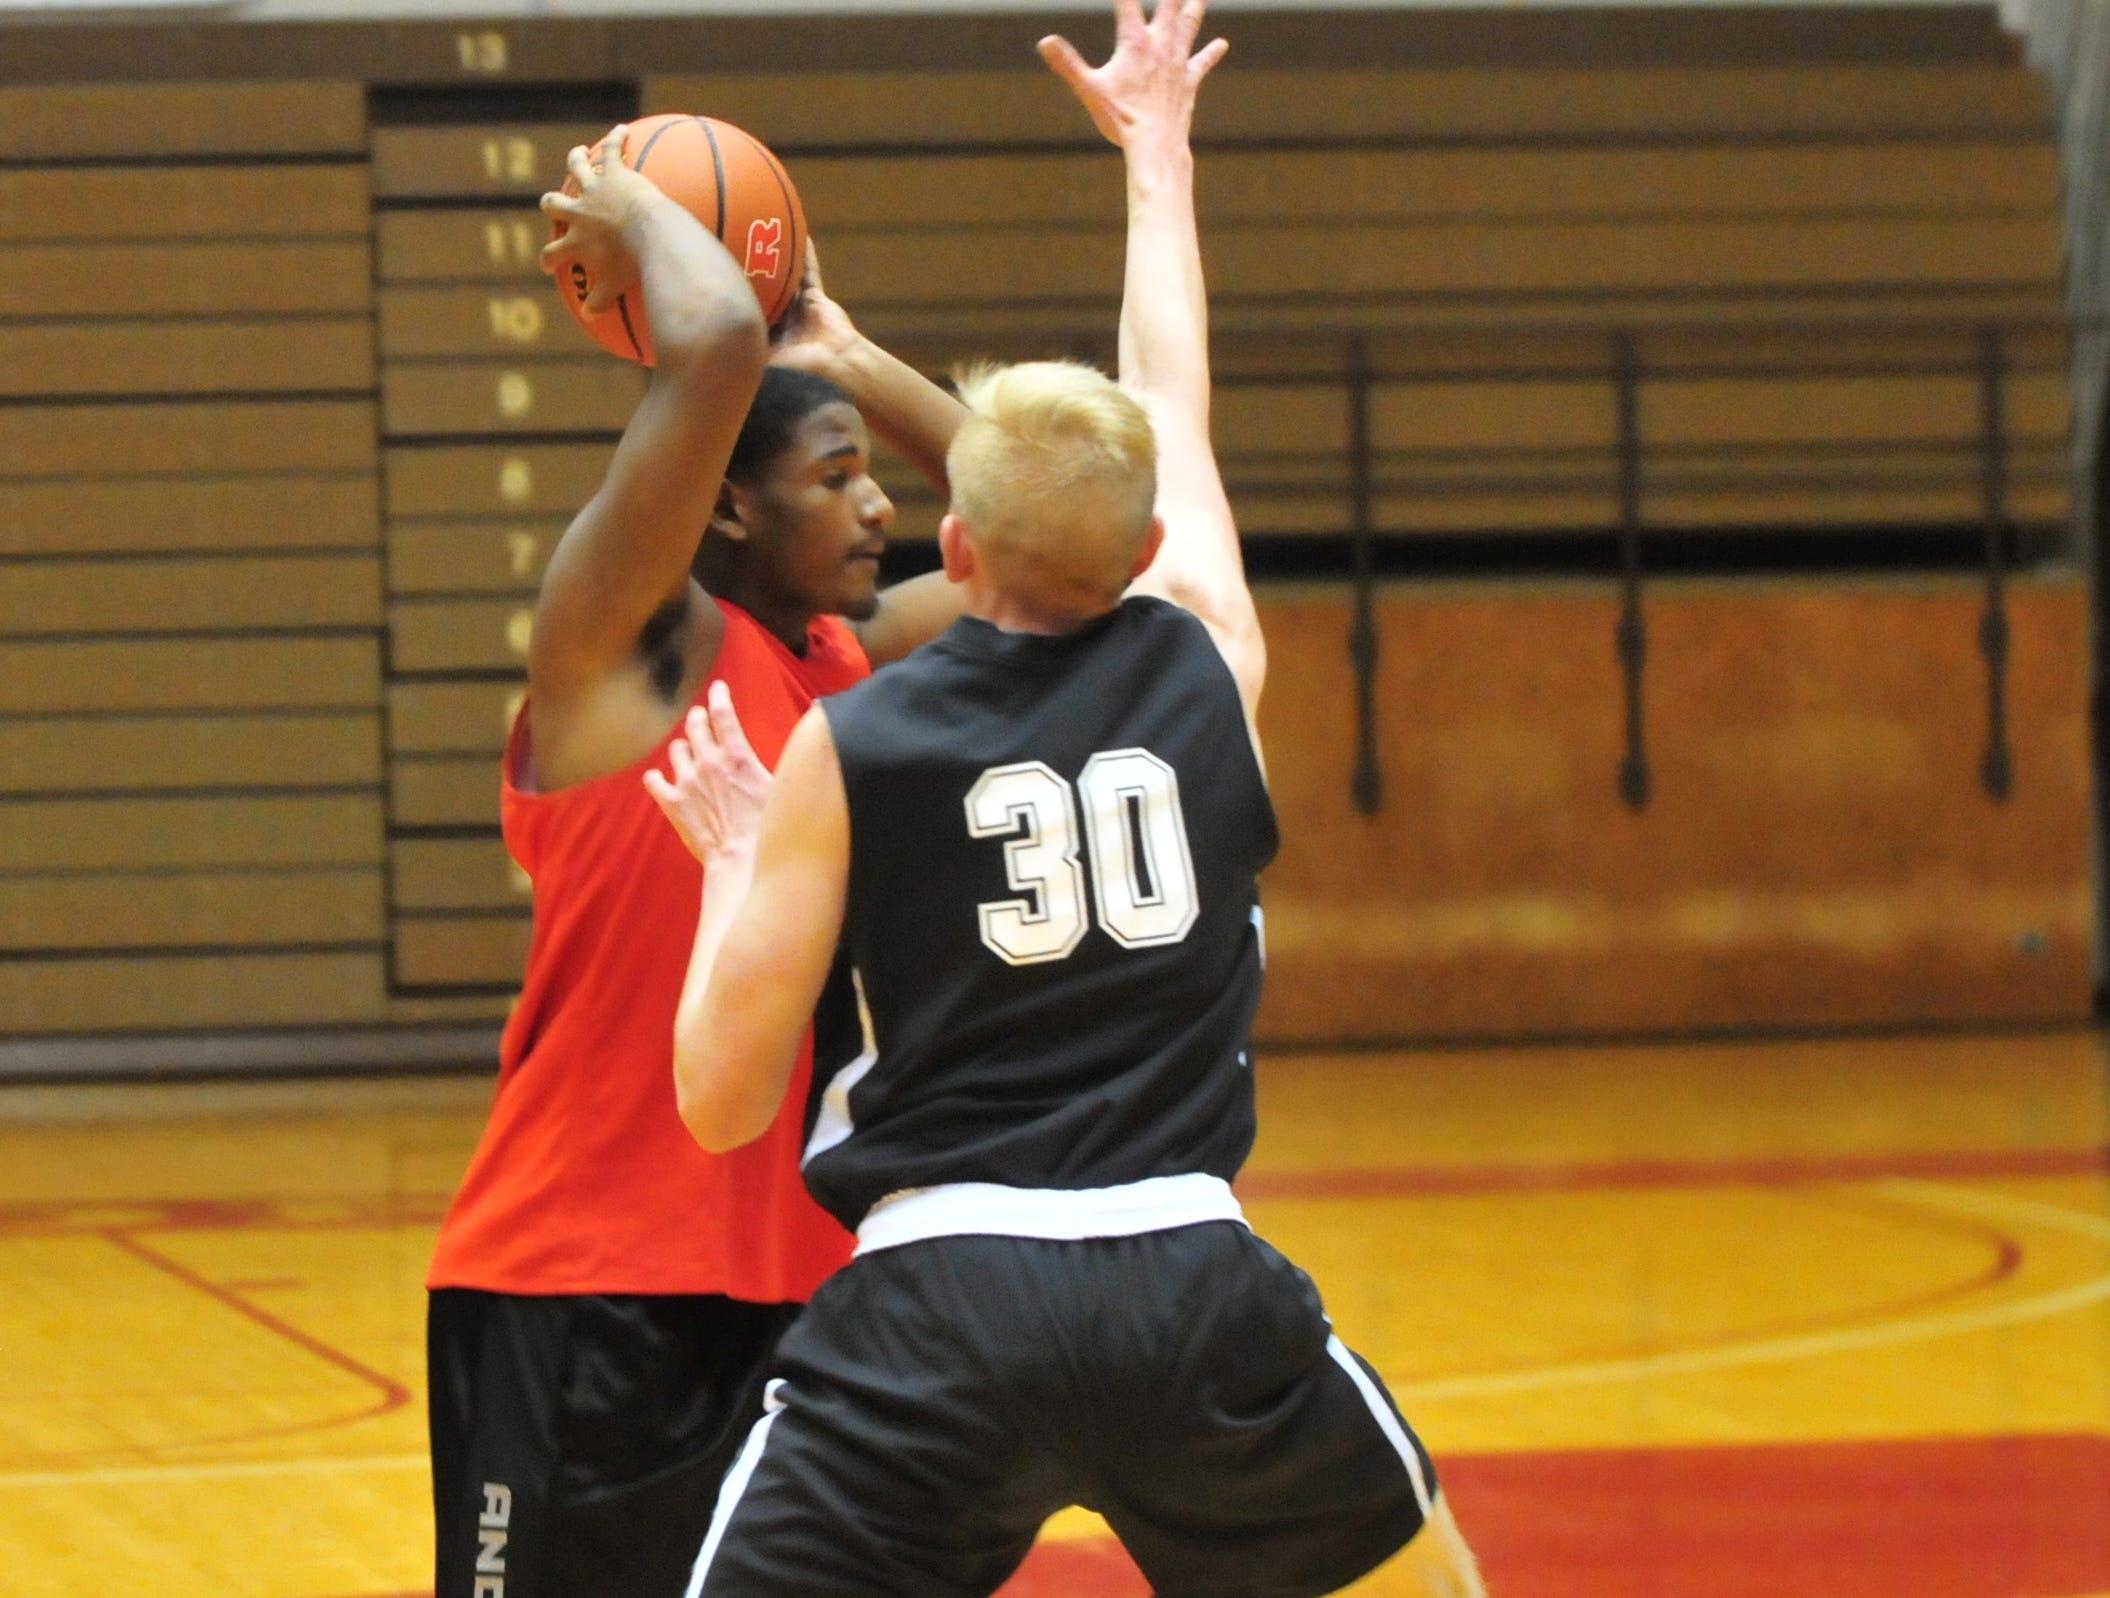 Richmond High School junior Rafael Deane during a boys basketball scrimmage against Franklin Central Saturday, Nov. 17, 2018 at Richmond High School's Tiernan Center.